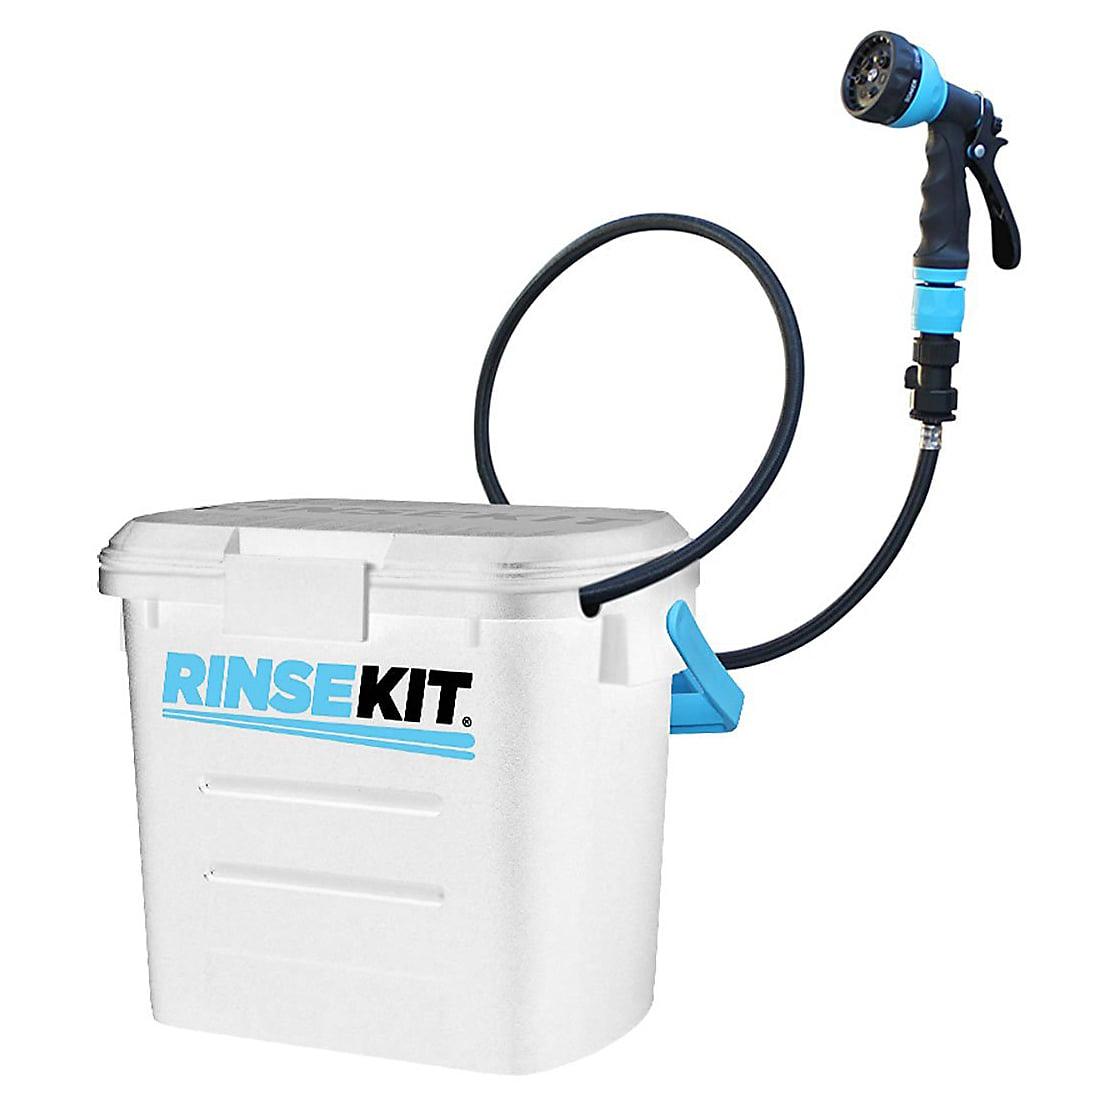 RinseKit Portable Shower 2 Gallon Sprayer White by RinseKit